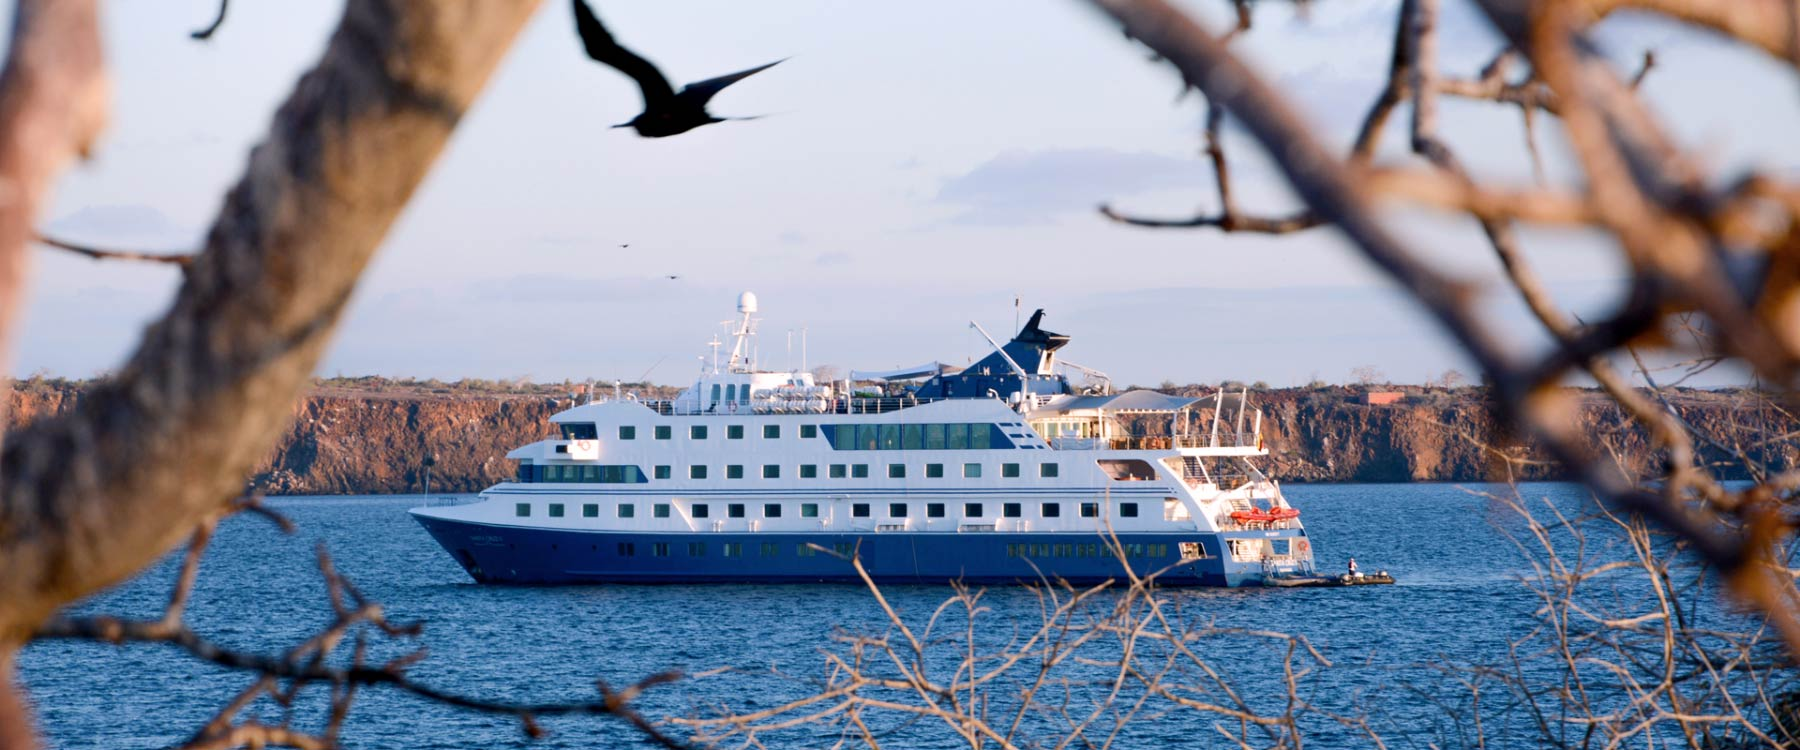 Santa cruz II first class cruise galapagos travel 2019